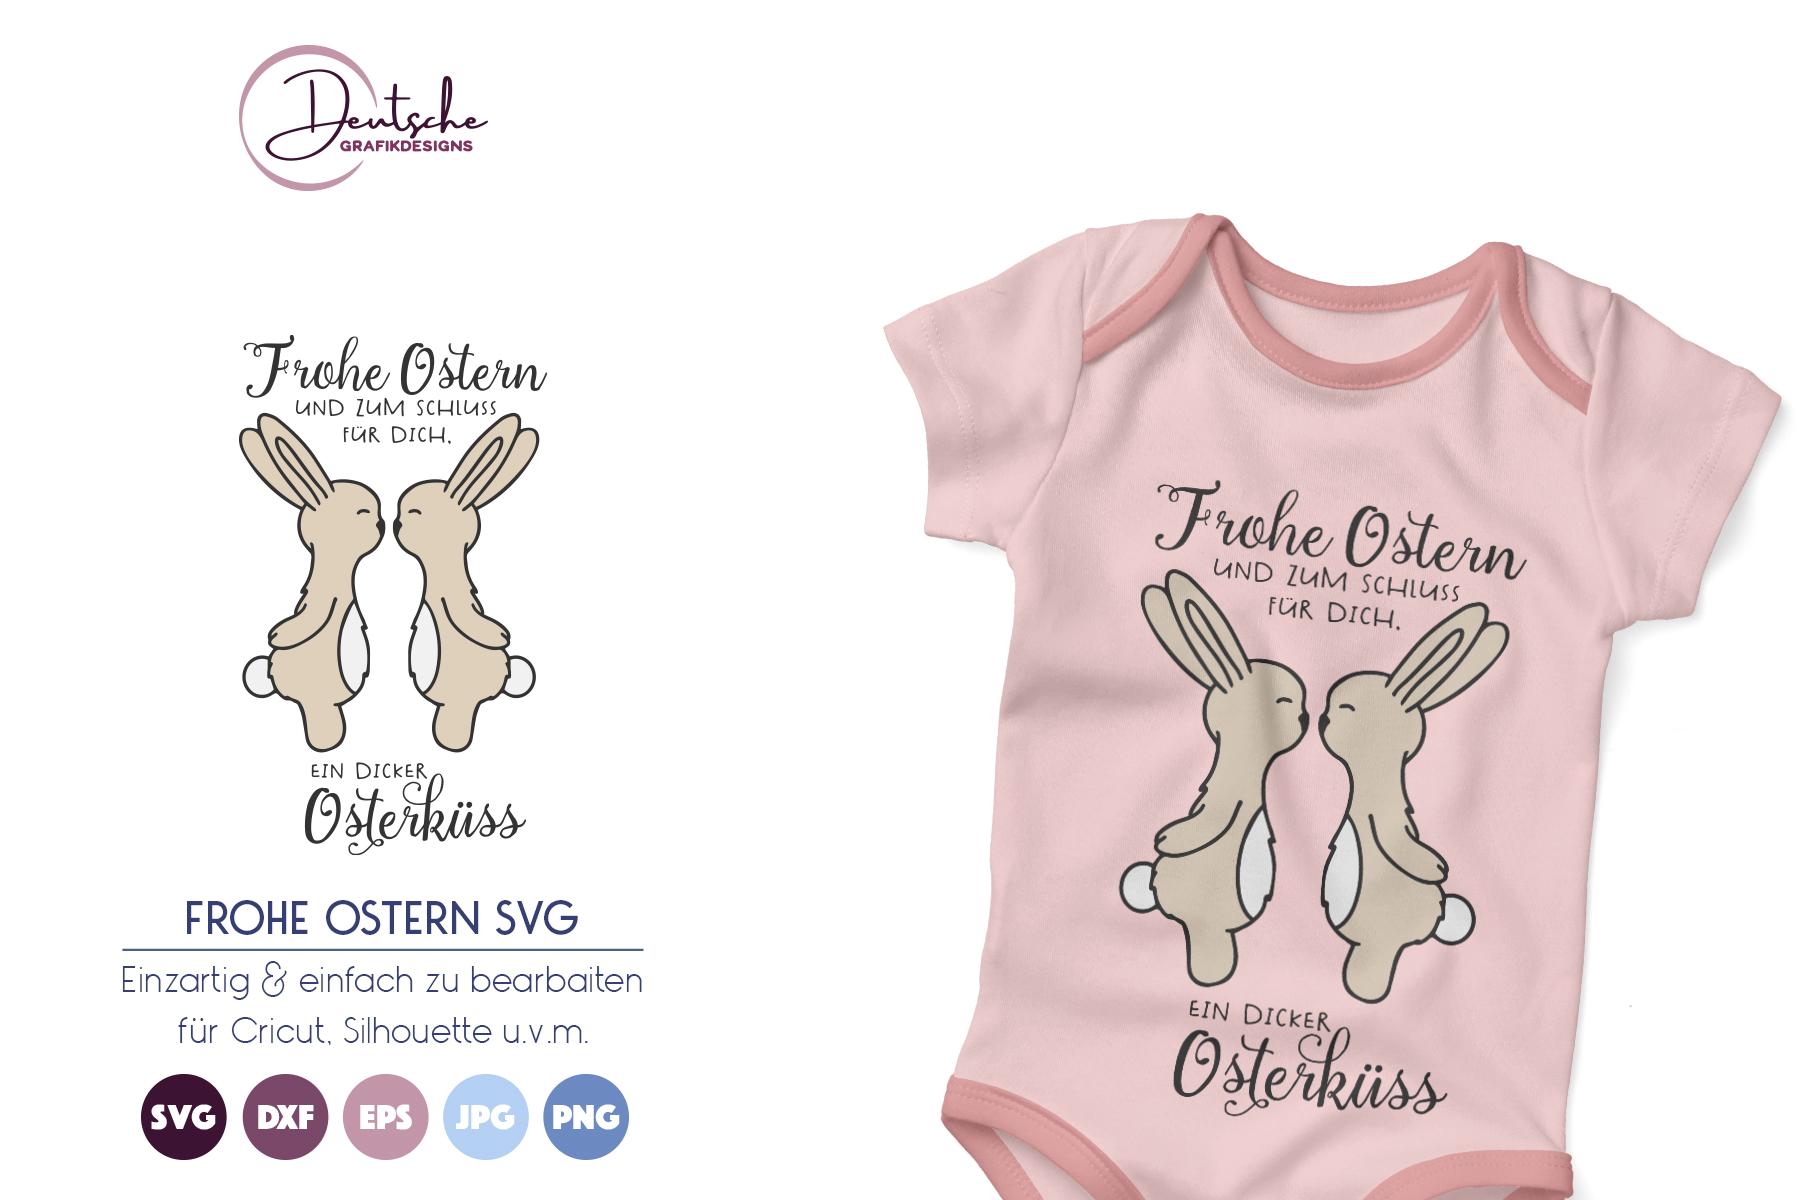 Osterhase SVG | Frohe Ostern | Osterküss example image 1